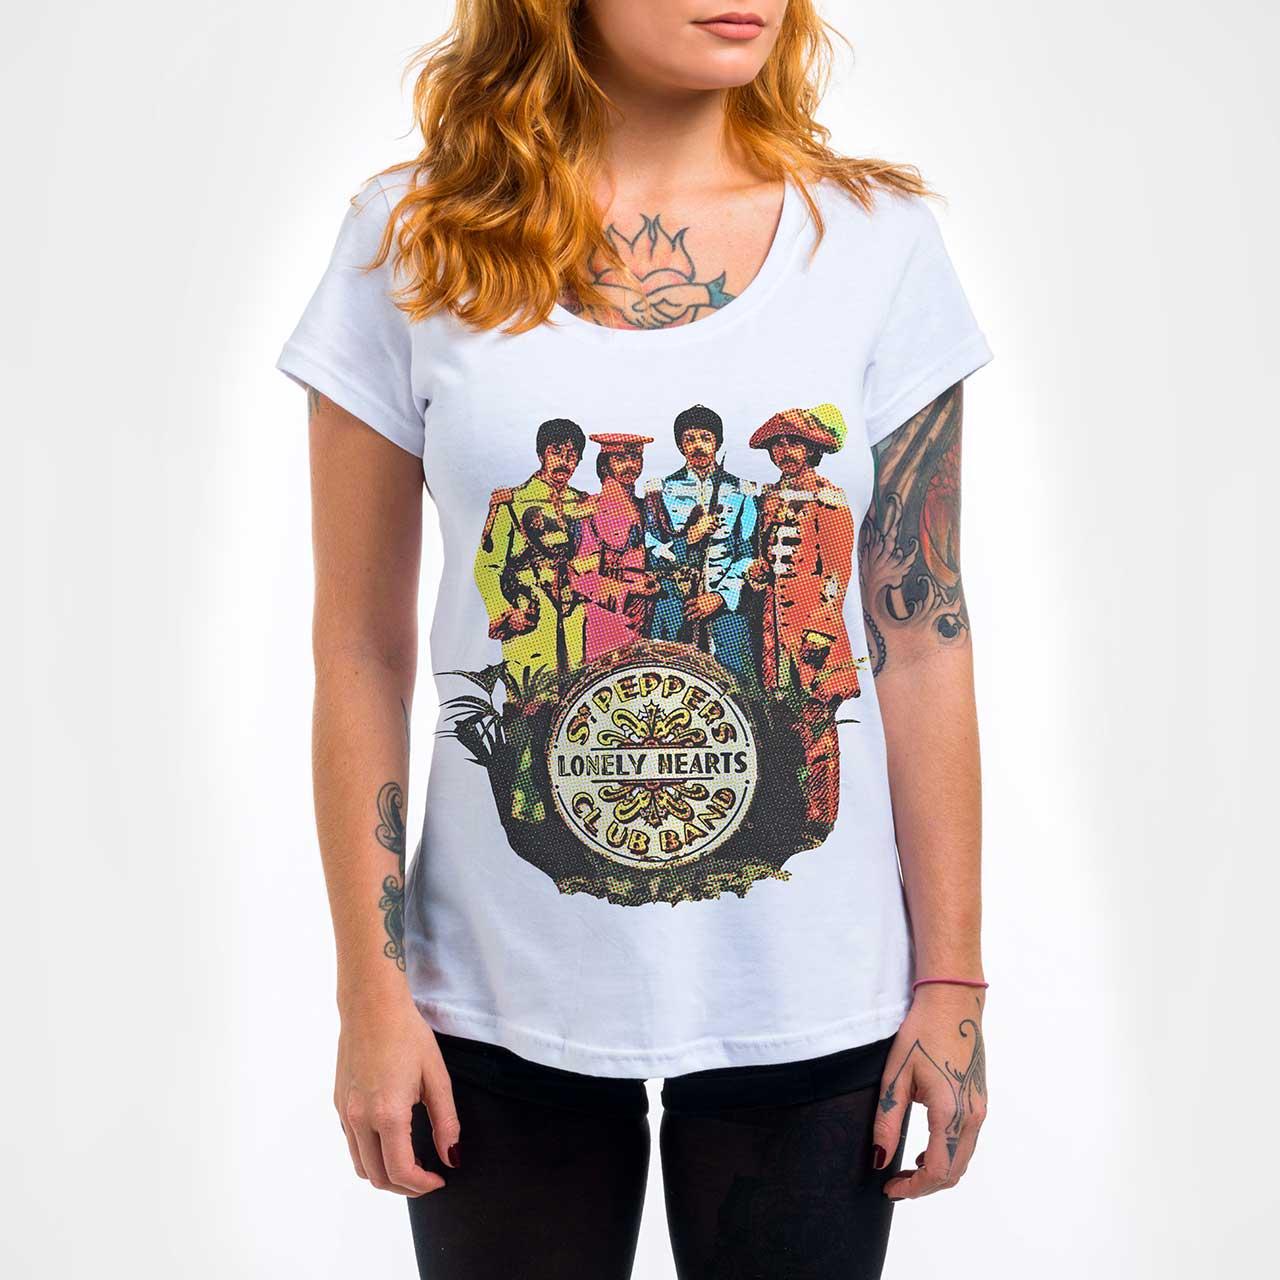 Camisa Feminina - Sgt Peppers